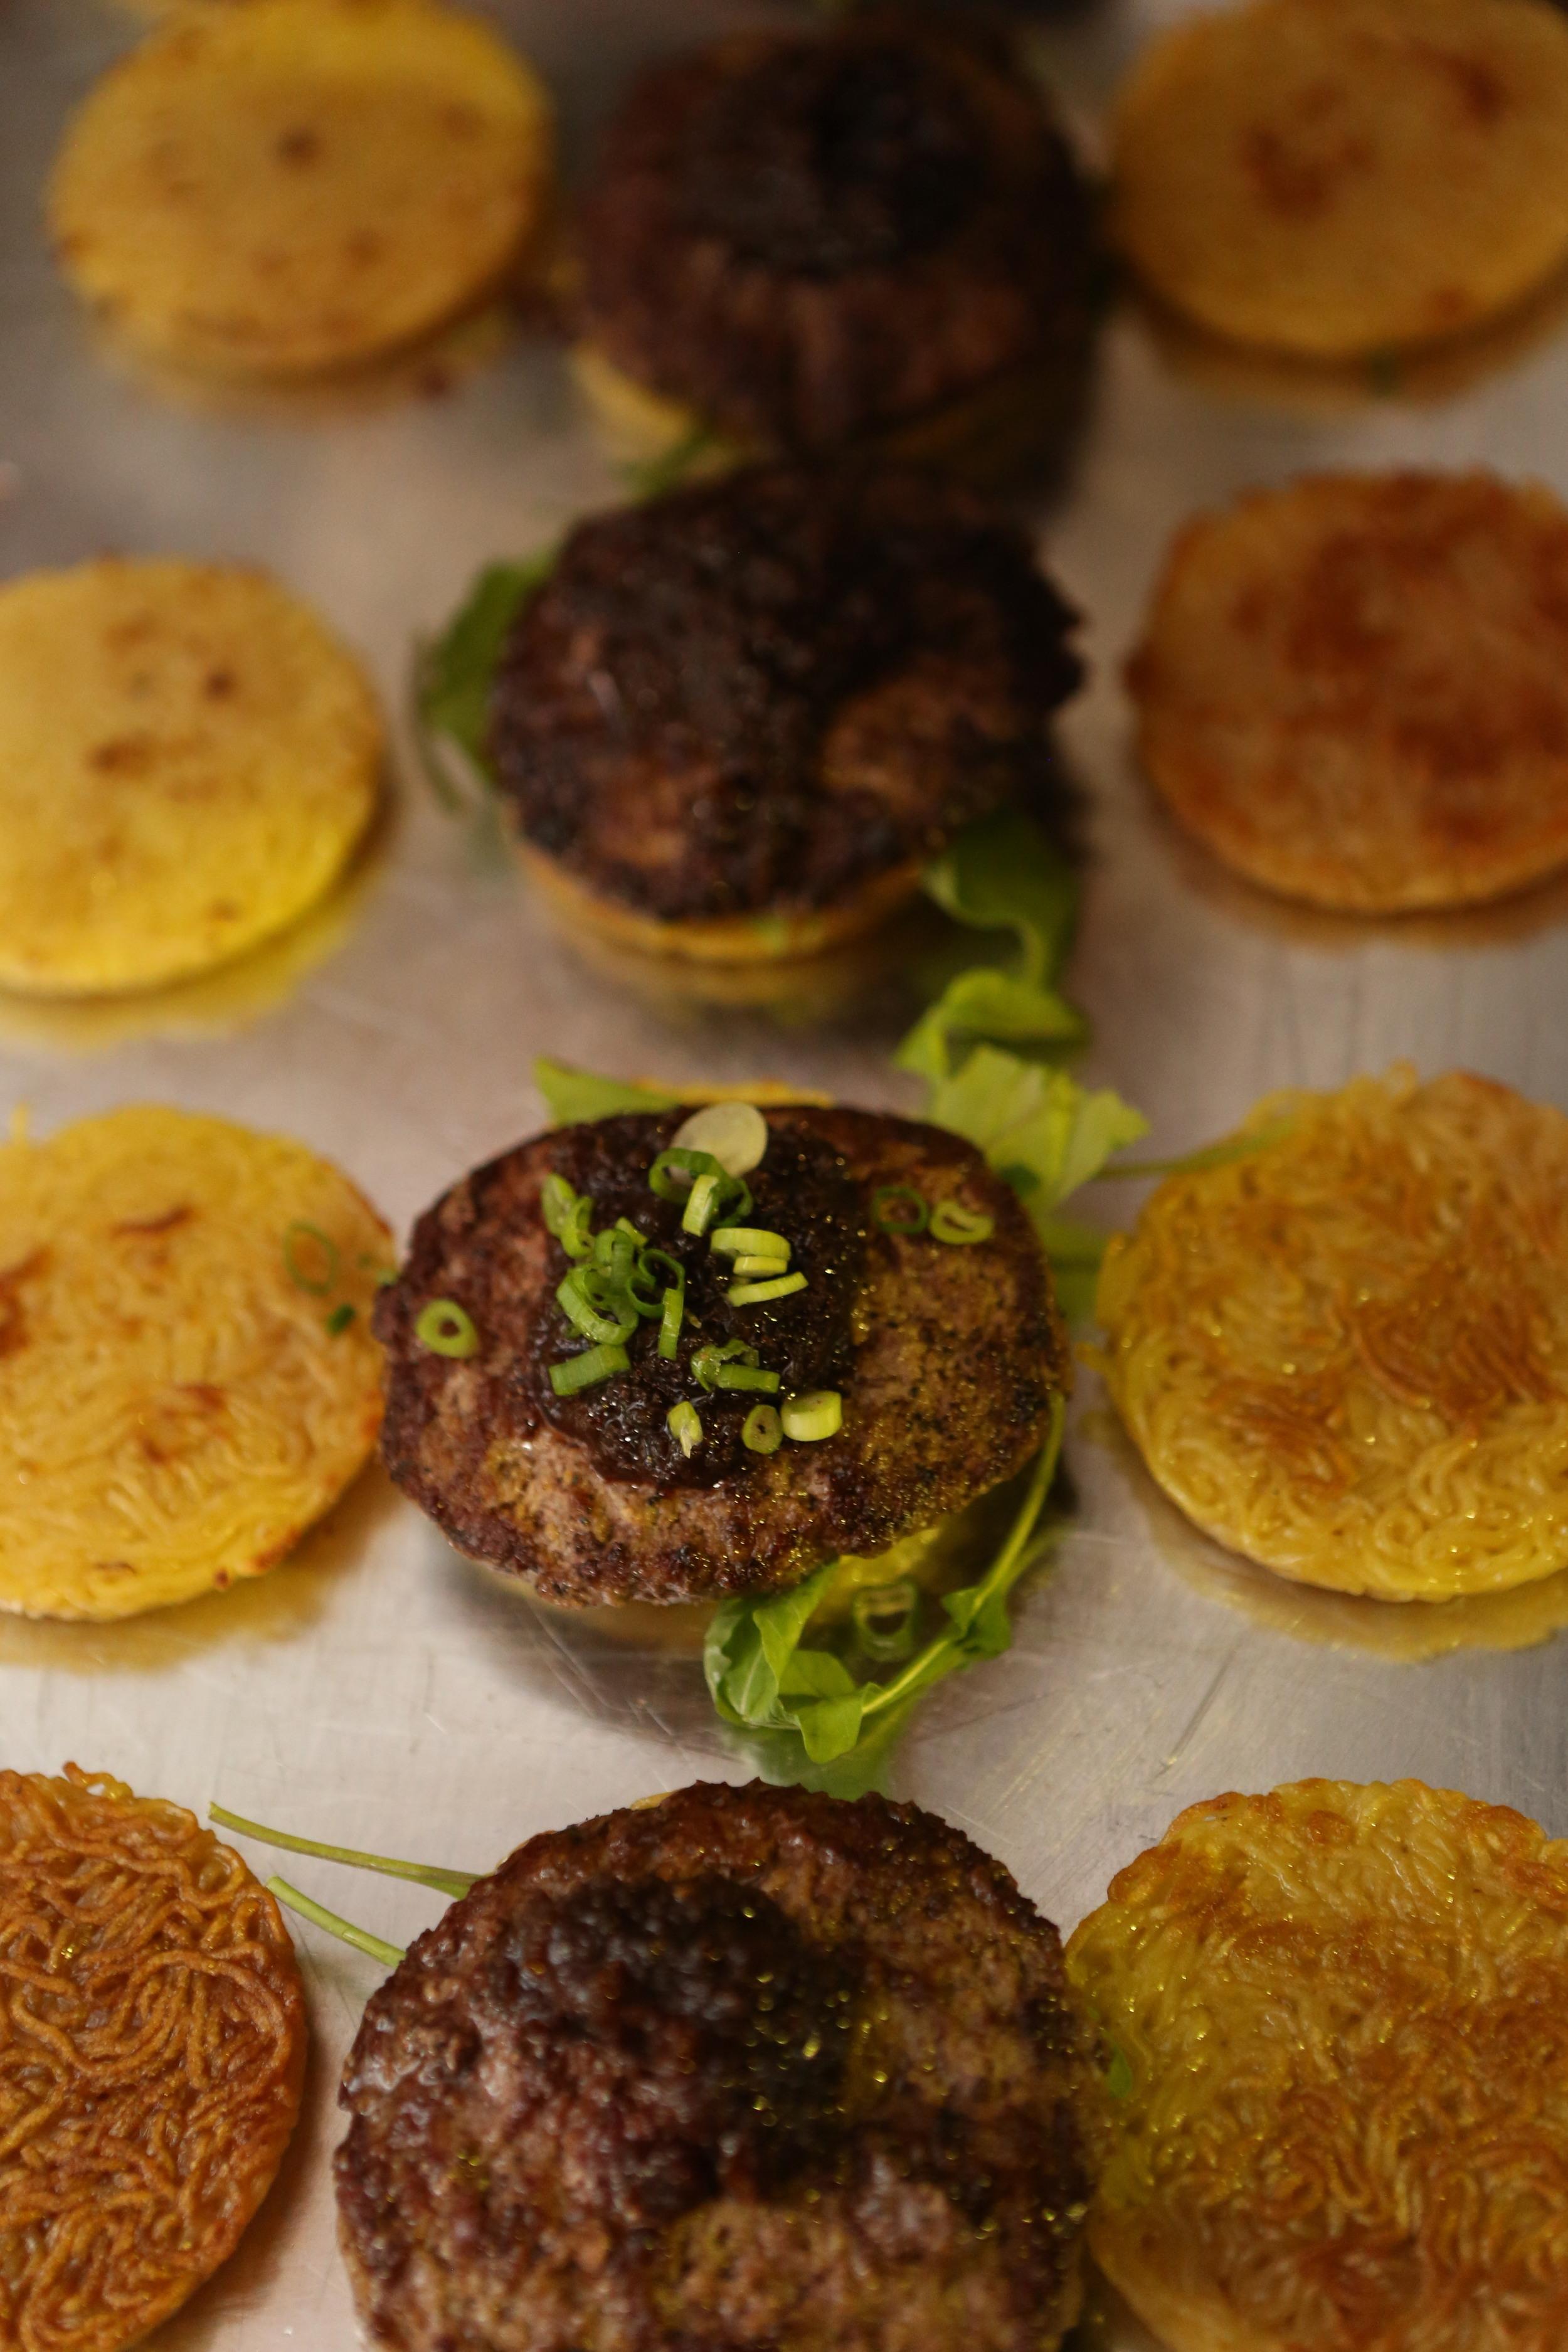 edible-adventure-010-ramen-burgers-and-more_13888365540_o.jpg